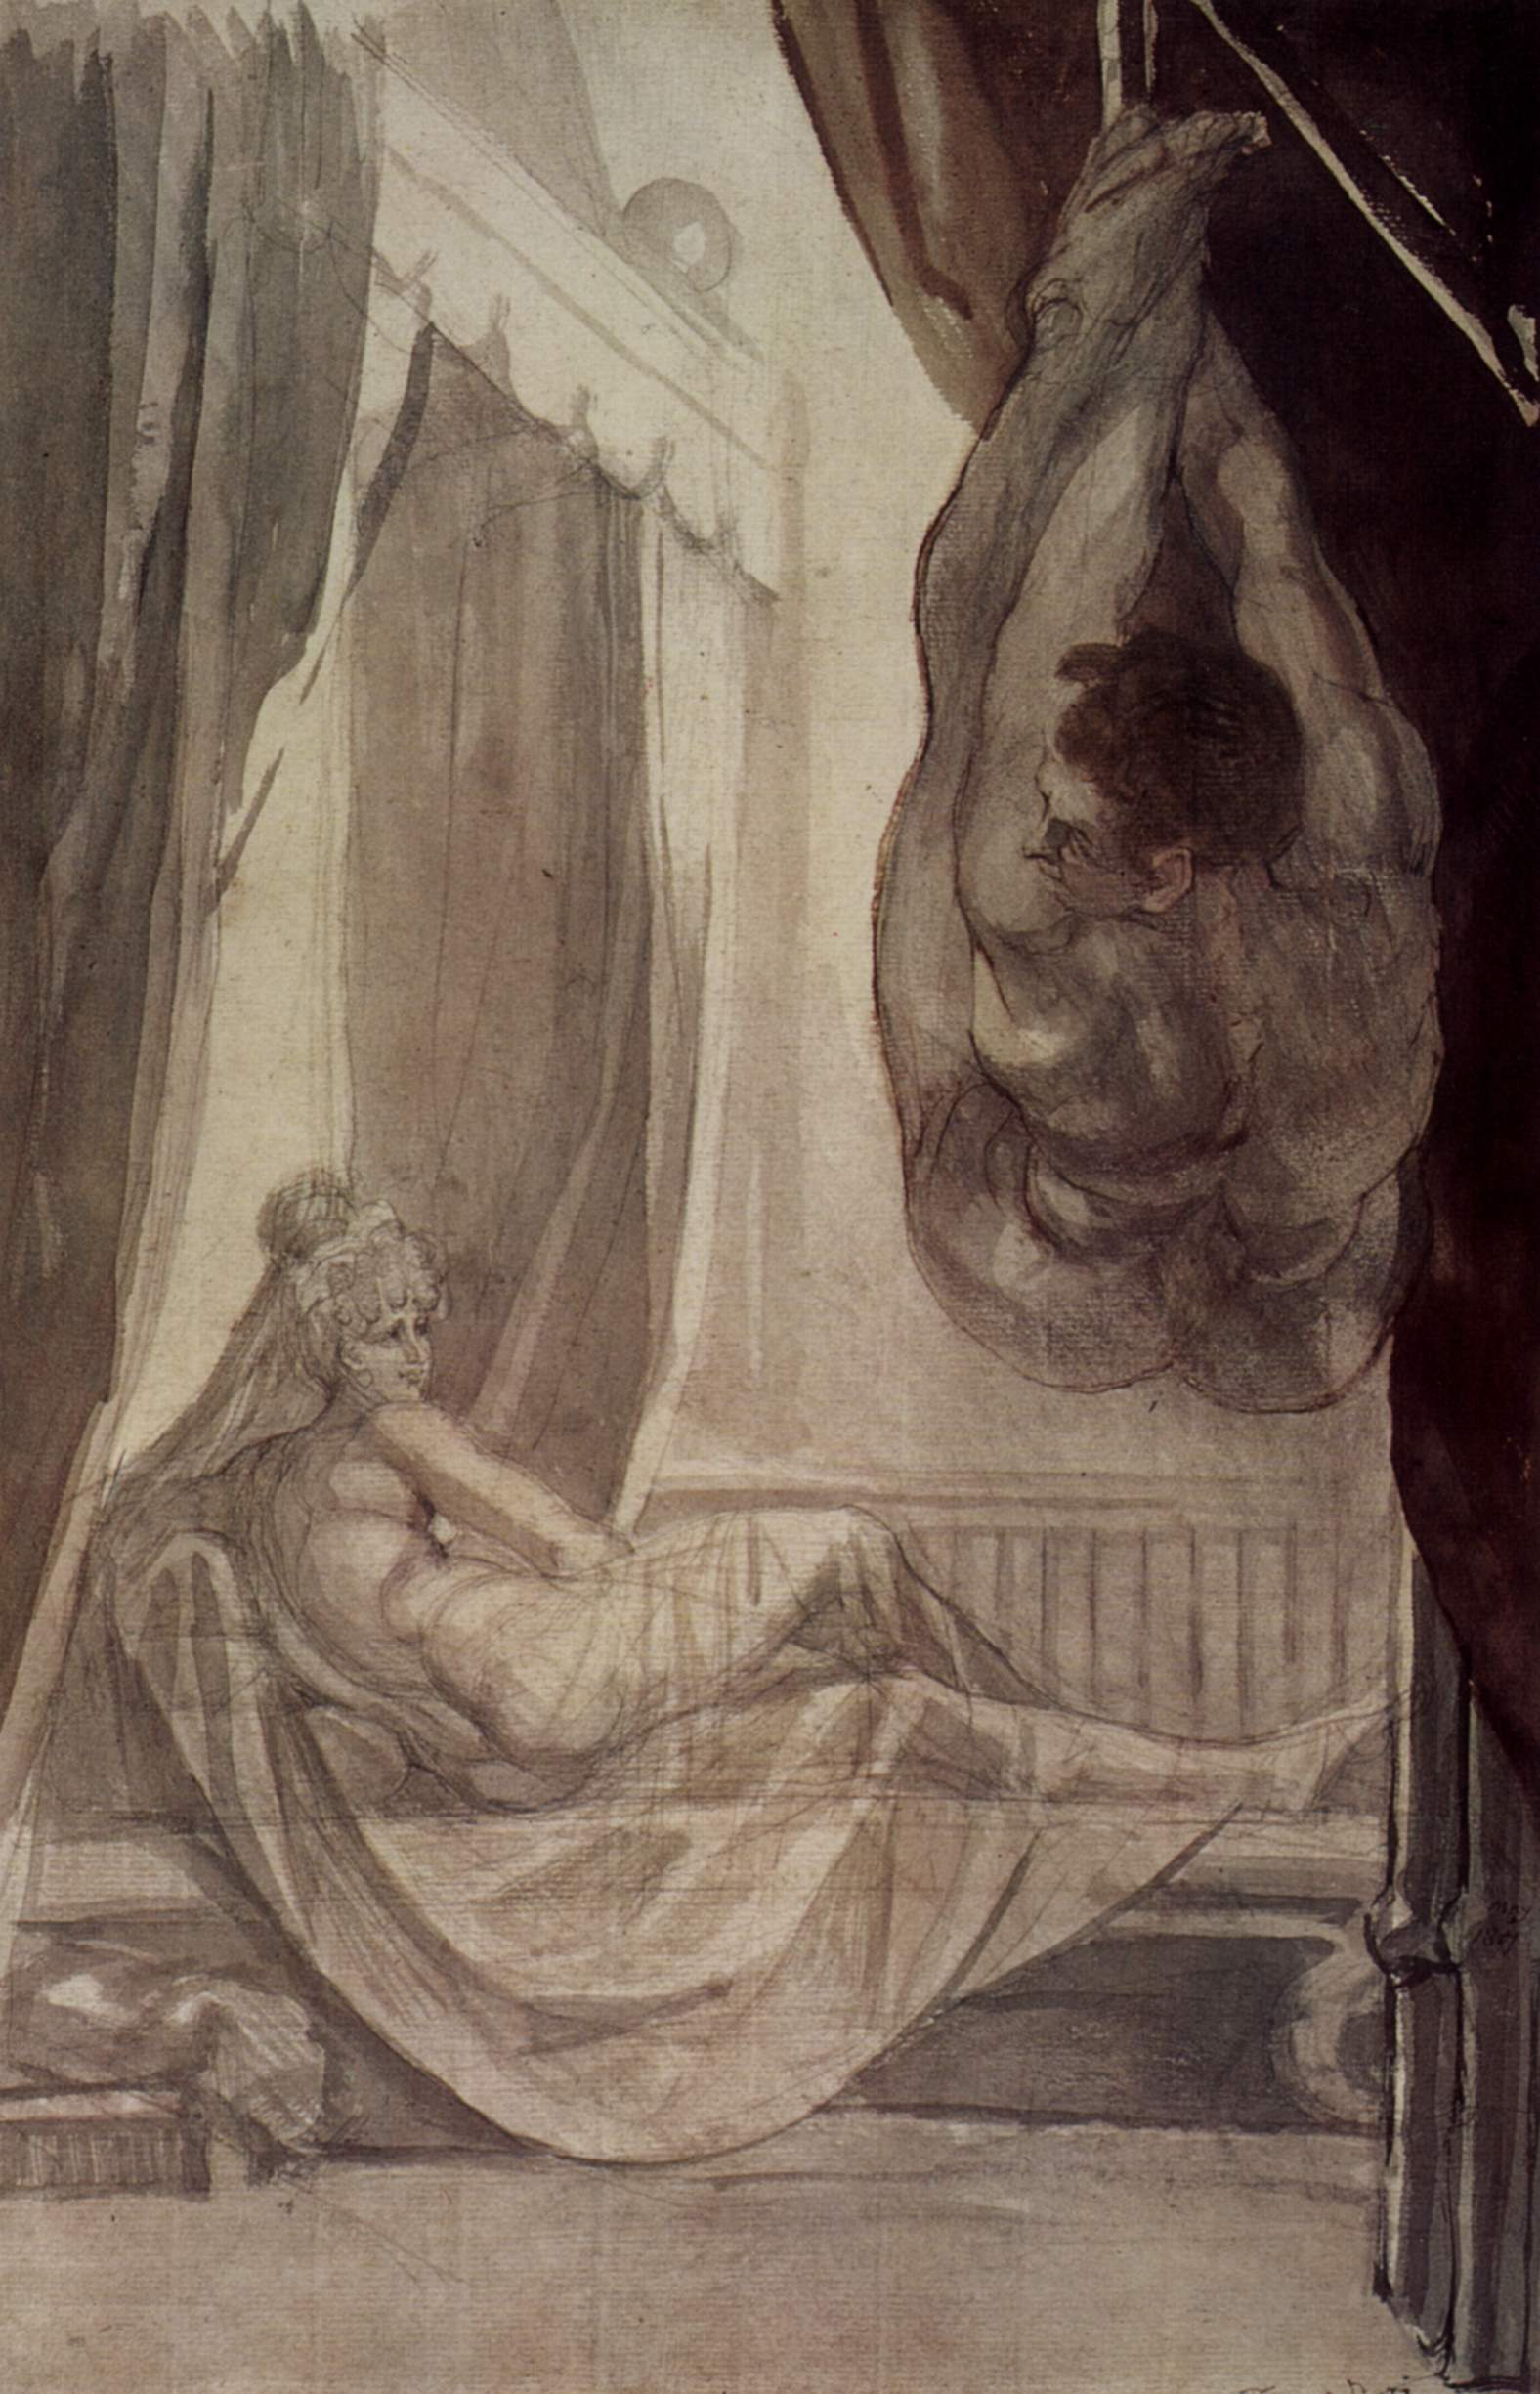 Johann Heinrich Füssli, Brunhilde beobachtet Gunther, 1807, Nottingham Castle Museum